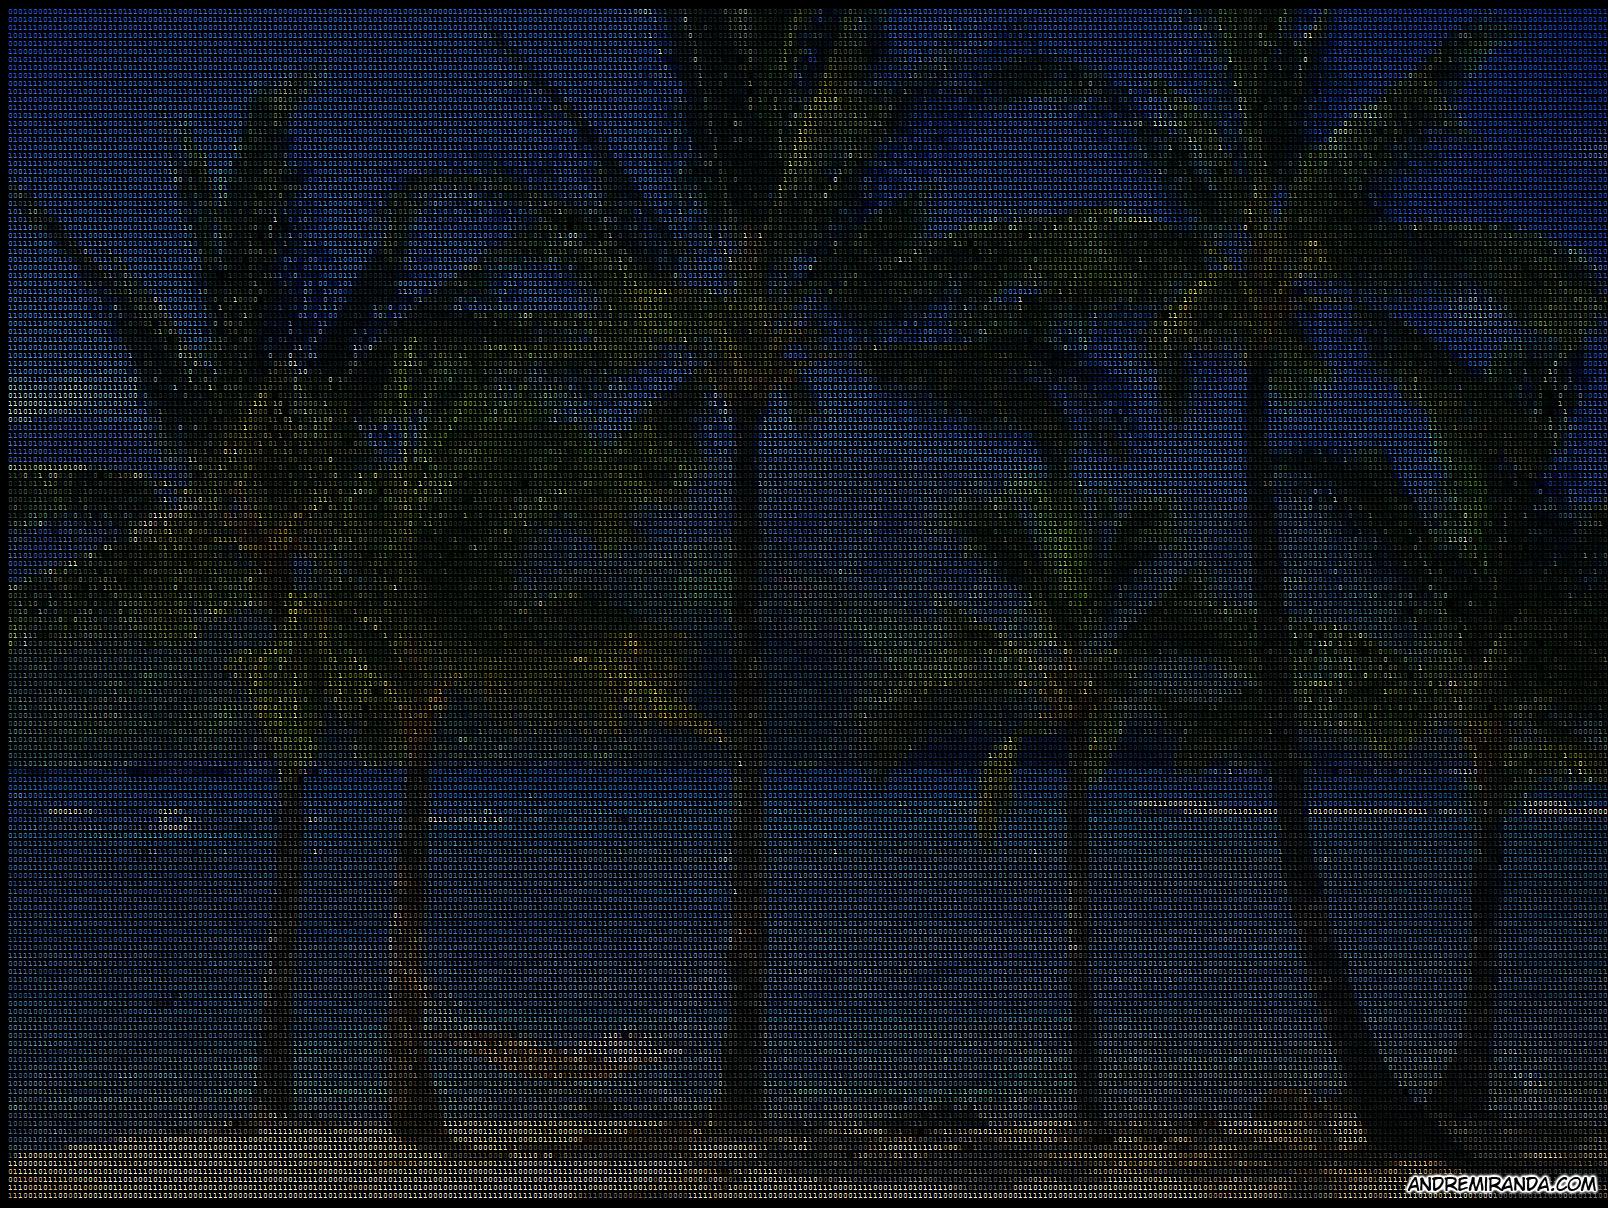 One Line Ascii Art Beach : Image ascii art beach by andremirandarosa on deviantart